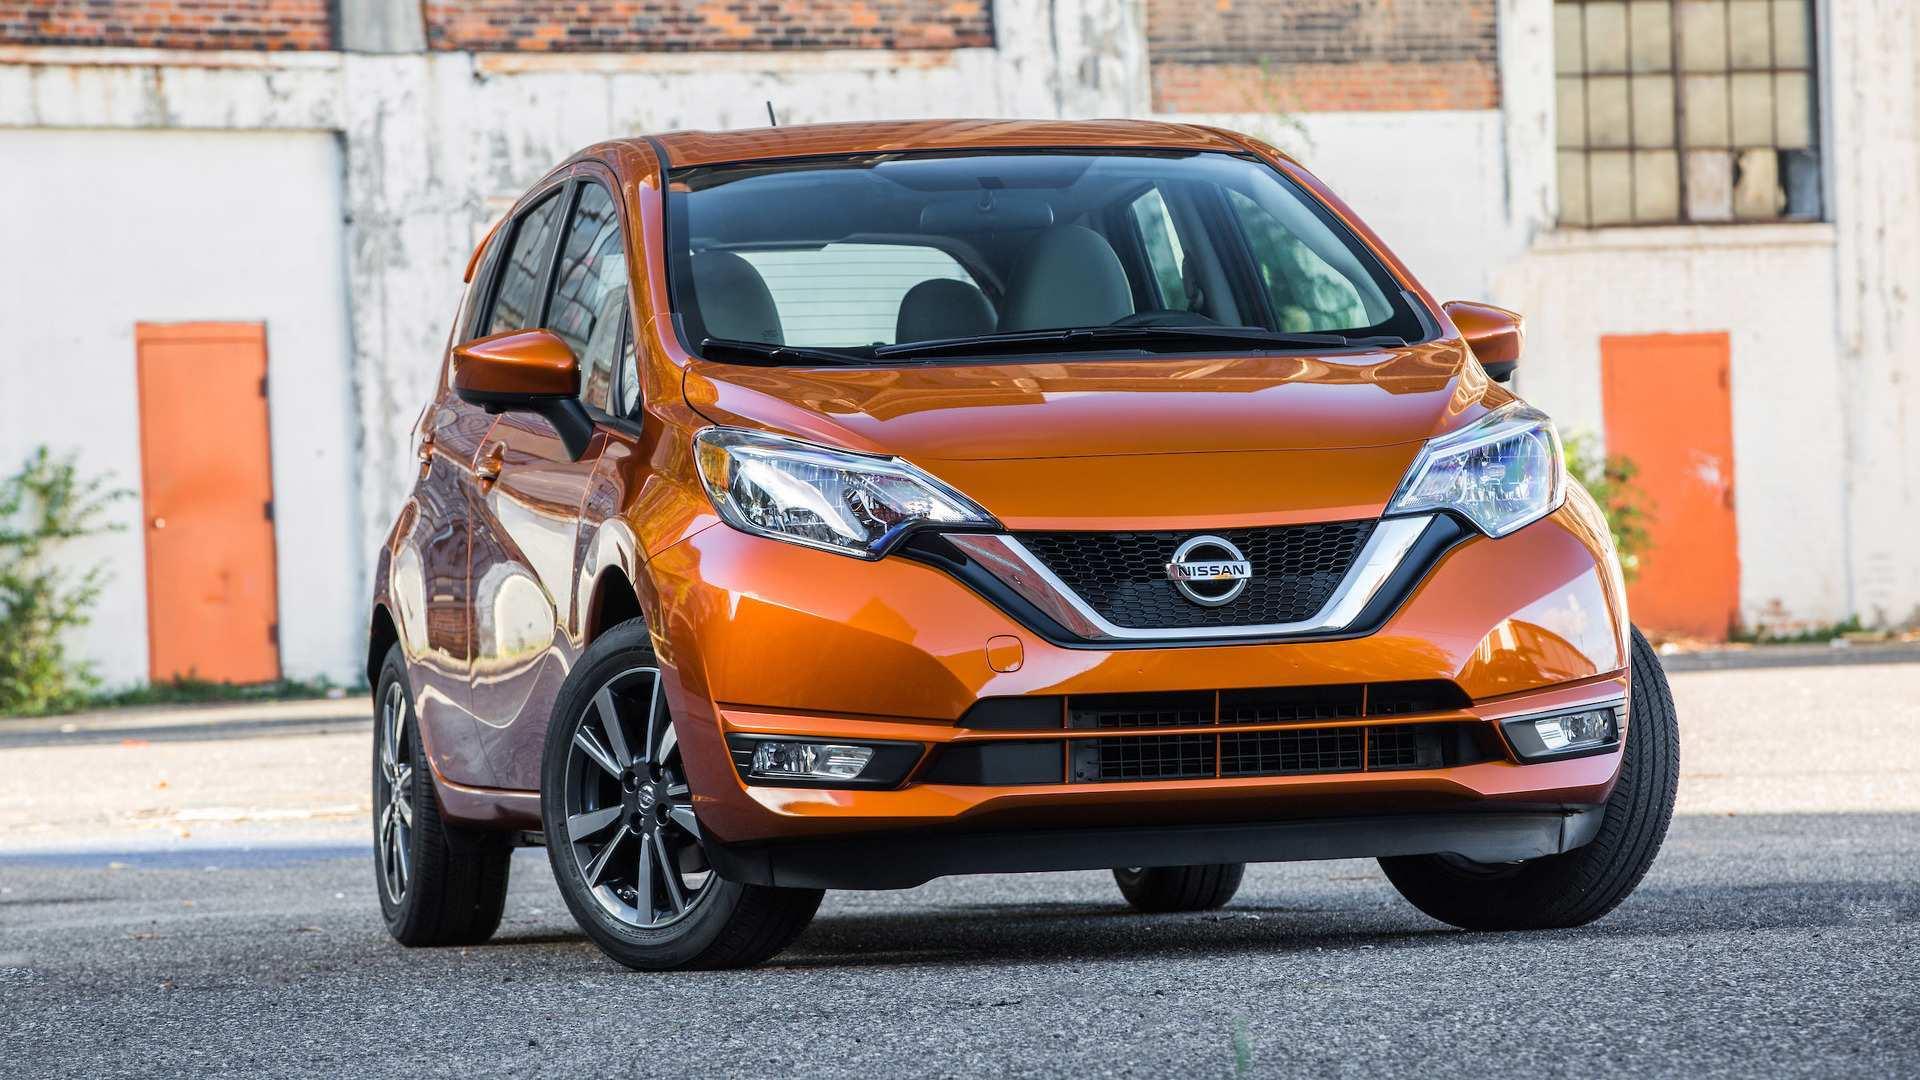 59 New 2020 Nissan Versa Hatchback Performance for 2020 Nissan Versa Hatchback